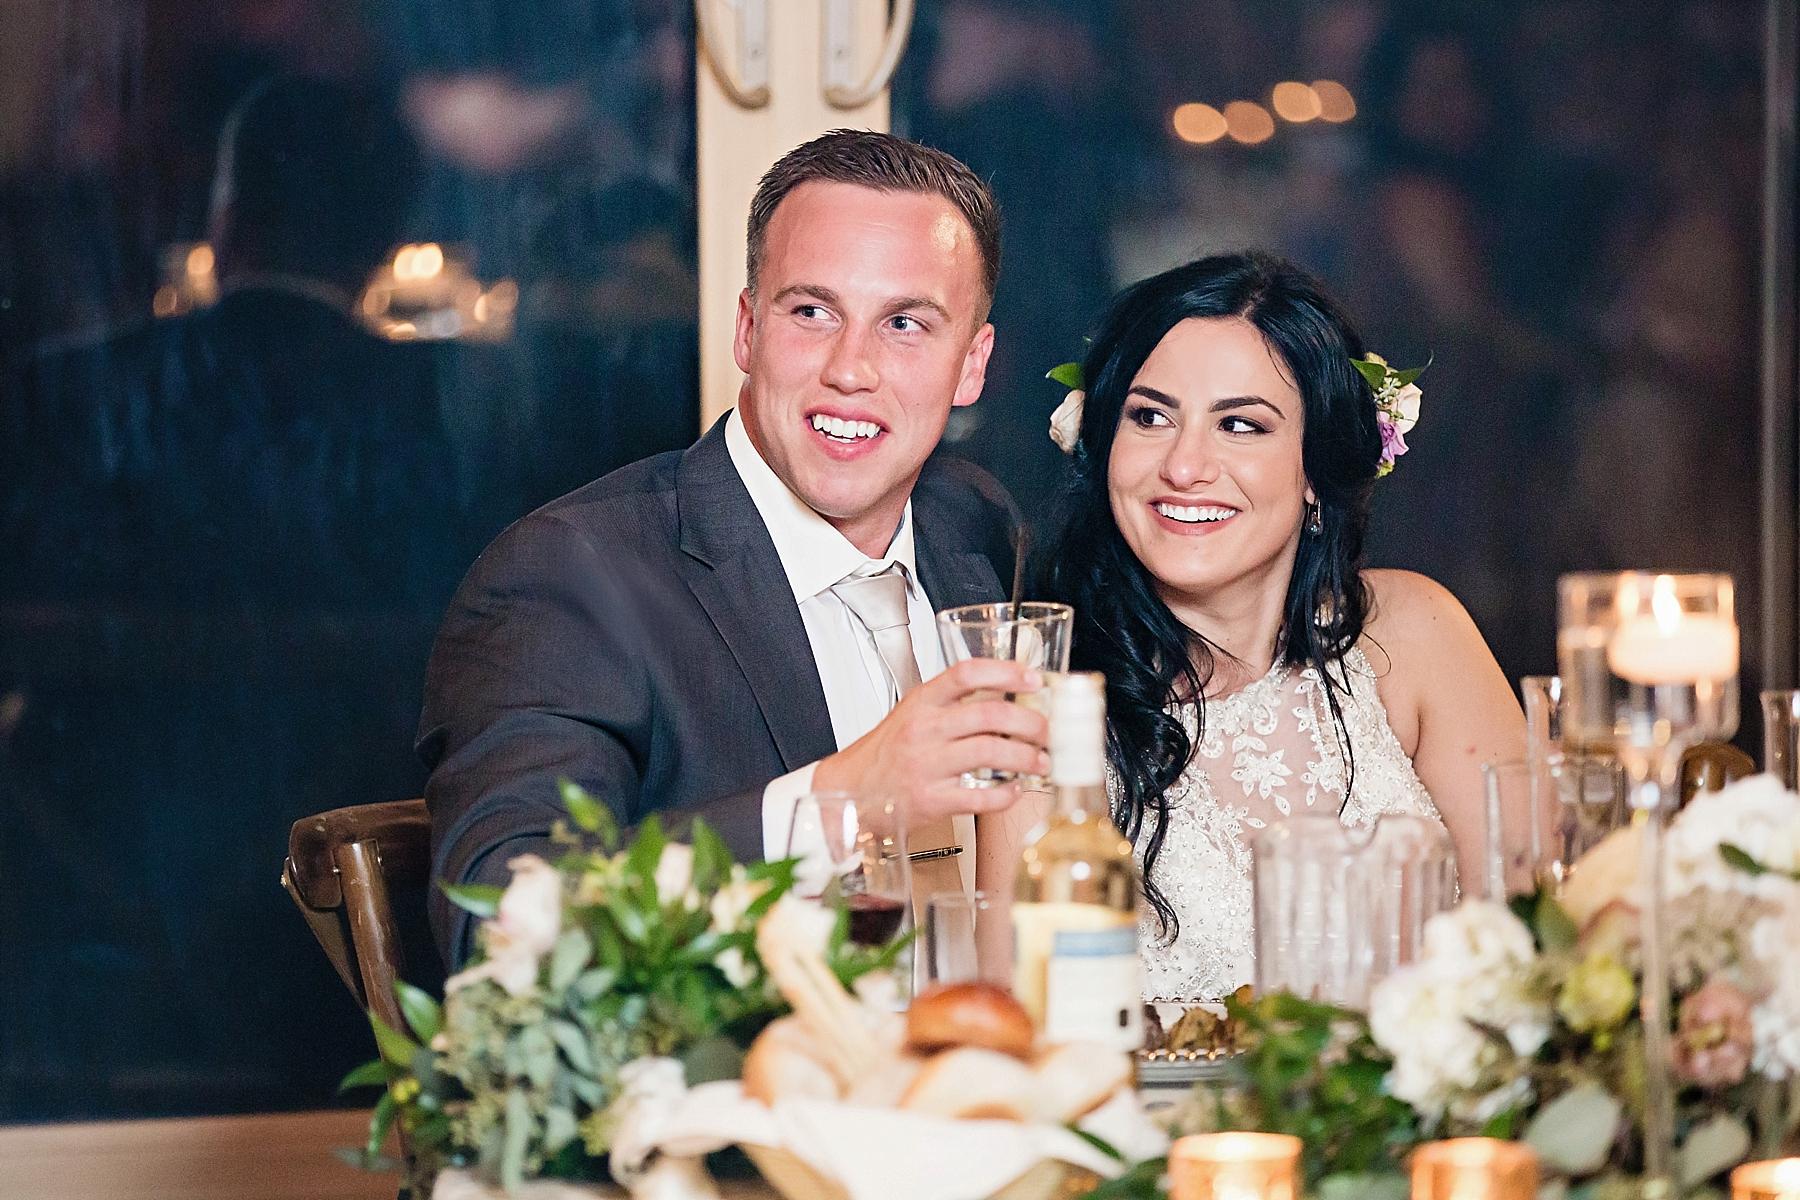 windsor-wedding-photographer-sprucewood-shores-winery-wedding-niagara-on-the-lake-wedding-photographer-eryn-shea-photography_0088.jpg